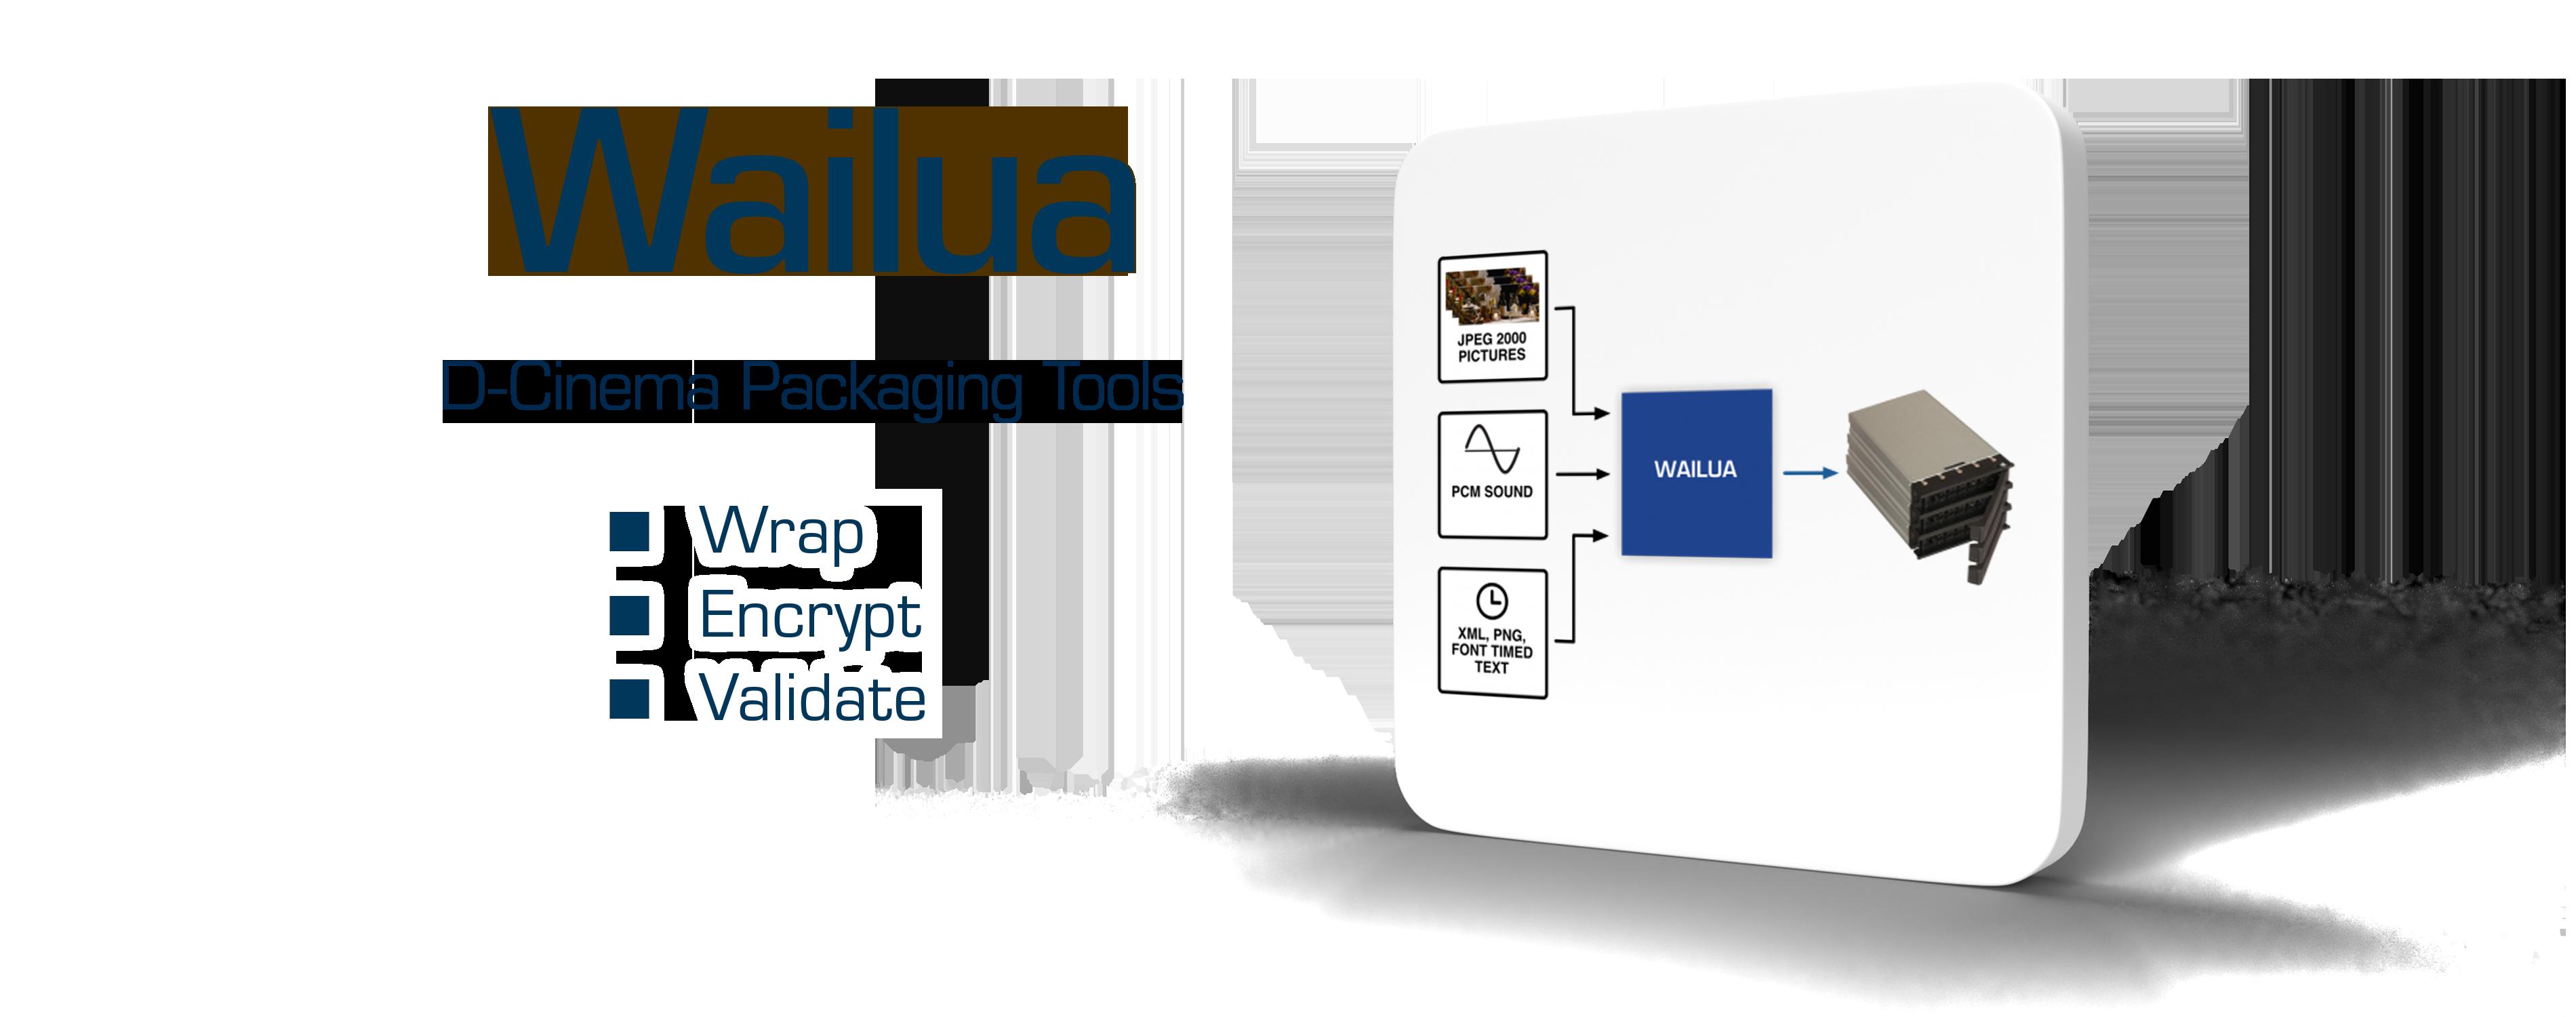 Wailua - Digital Cinema Packaging Tools - Wrap - Encrypt - Validate